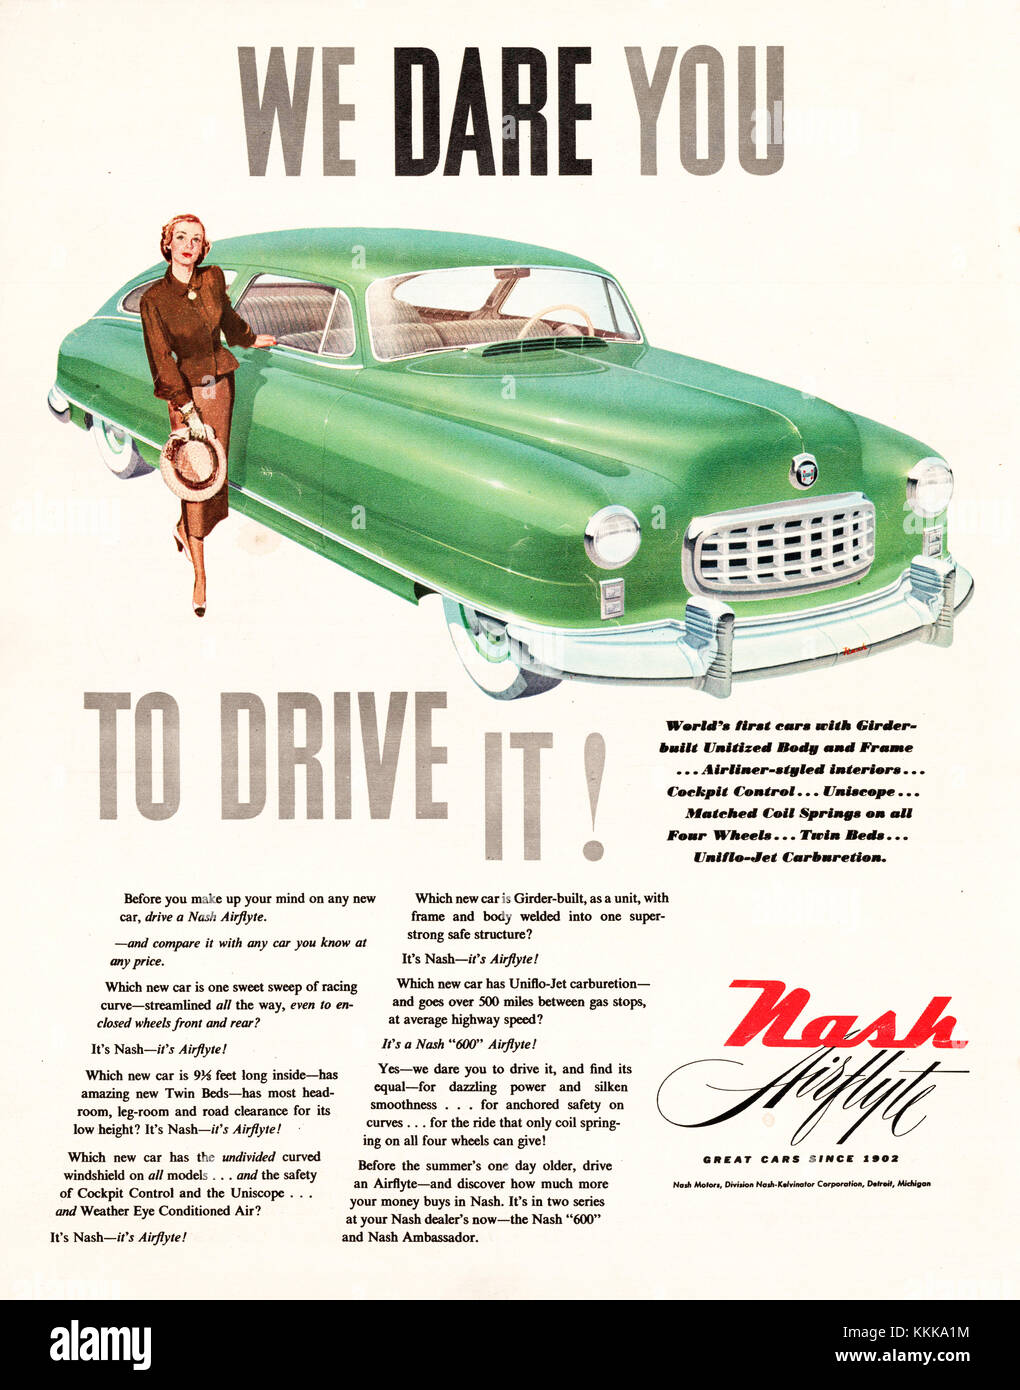 1949 U.S. Magazine Nash Cars Advert - Stock Image